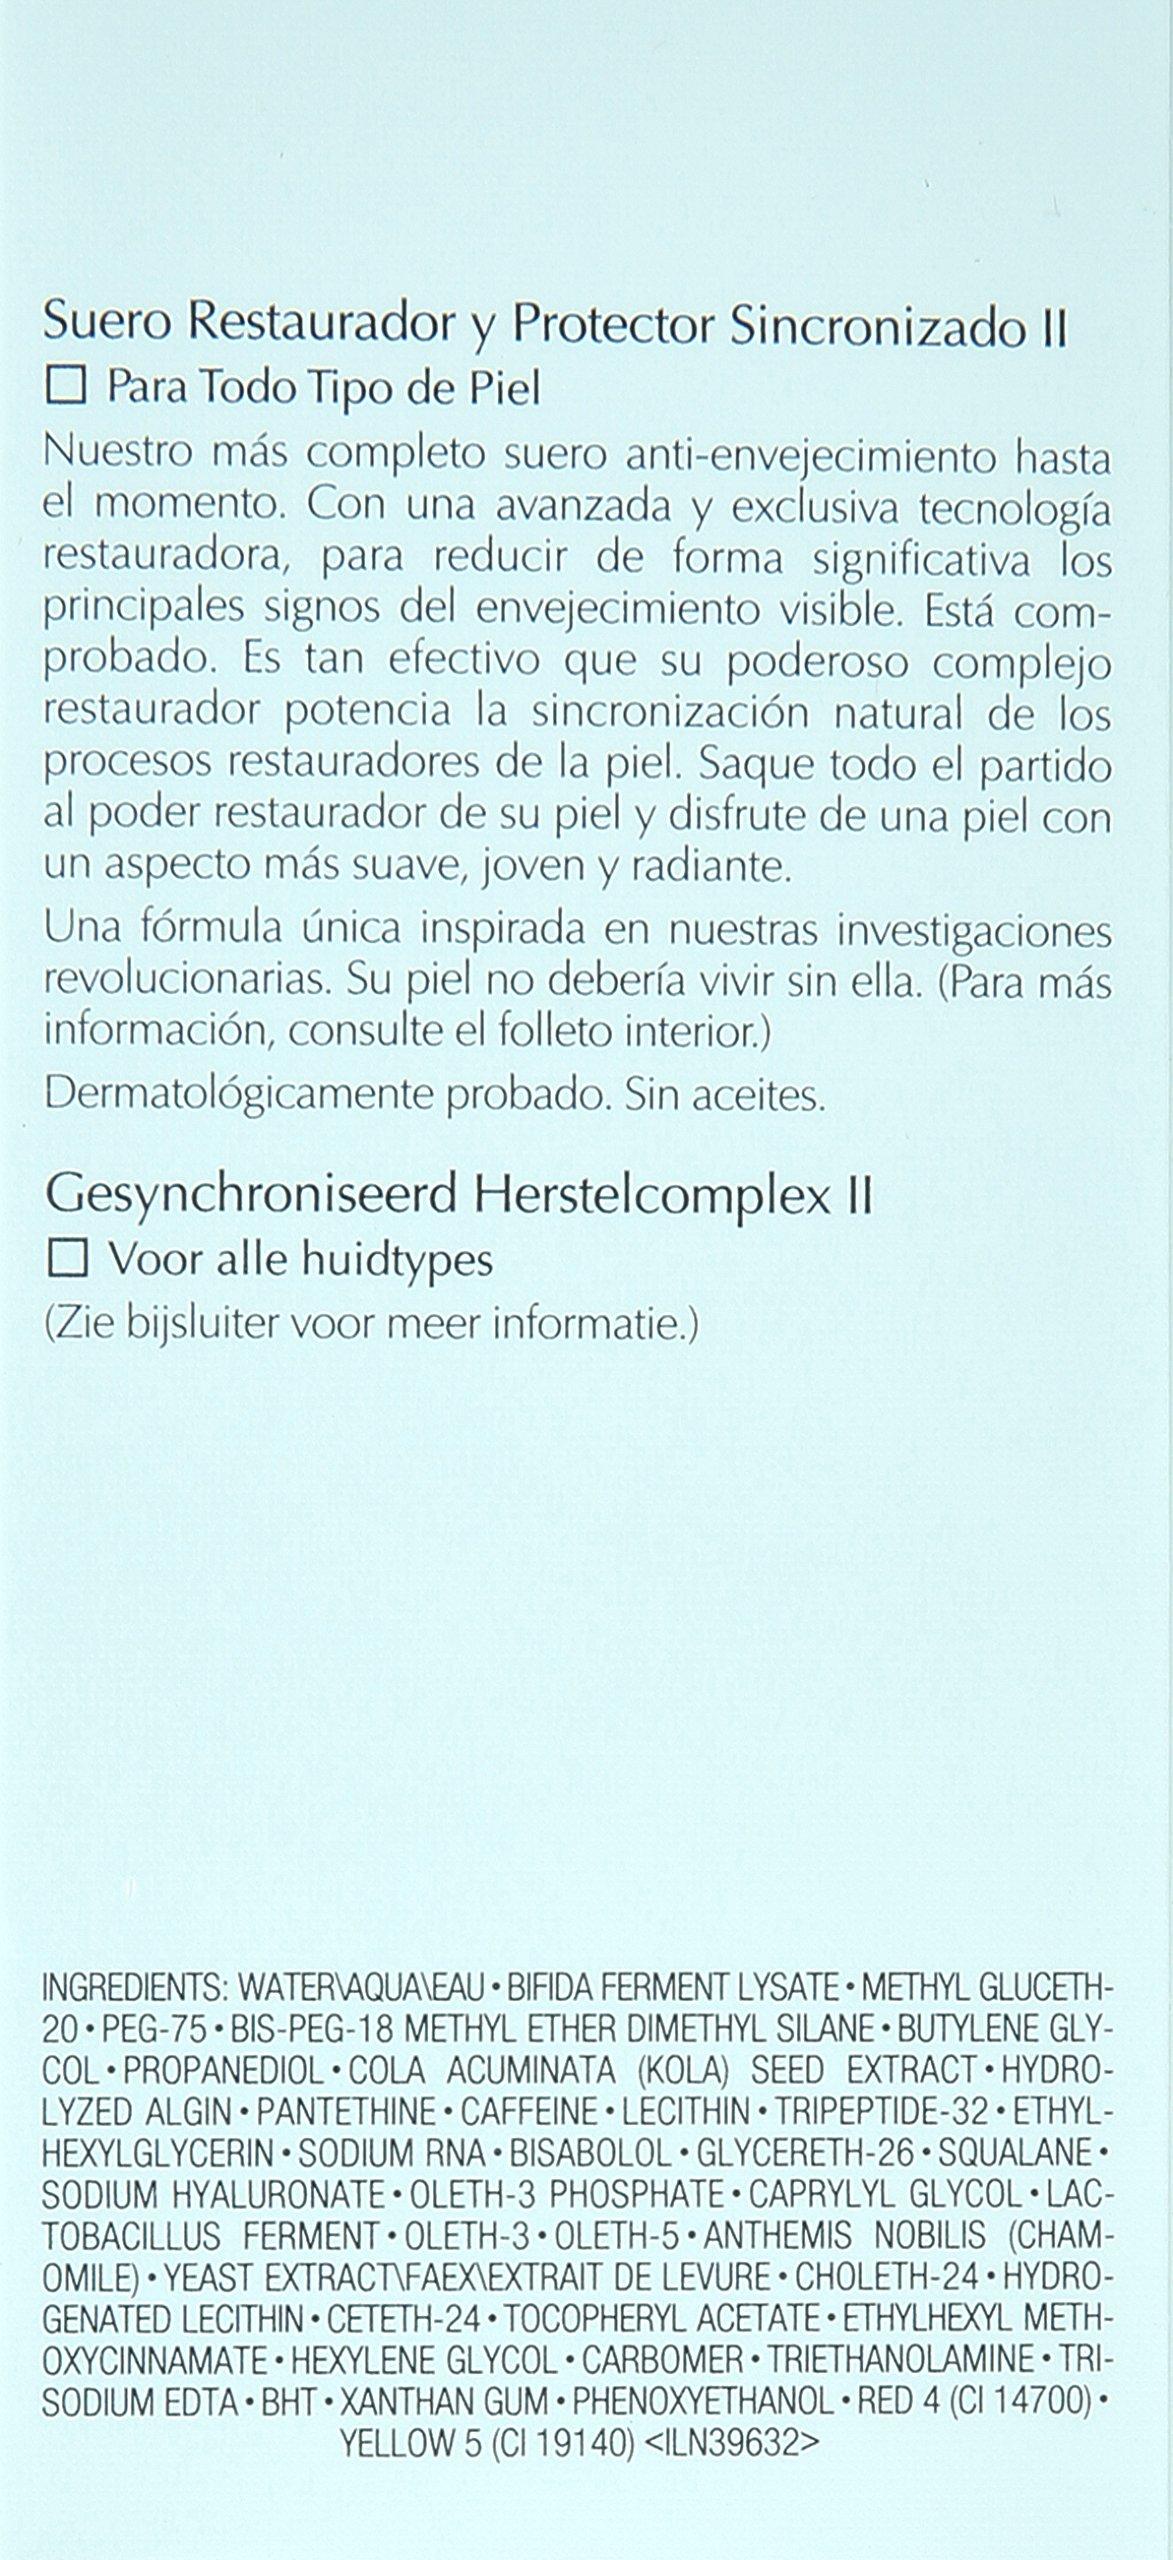 Estée Lauder Sérum Nocturno Facial «Advanced Night Repair» (piel normal) – 50 ml.